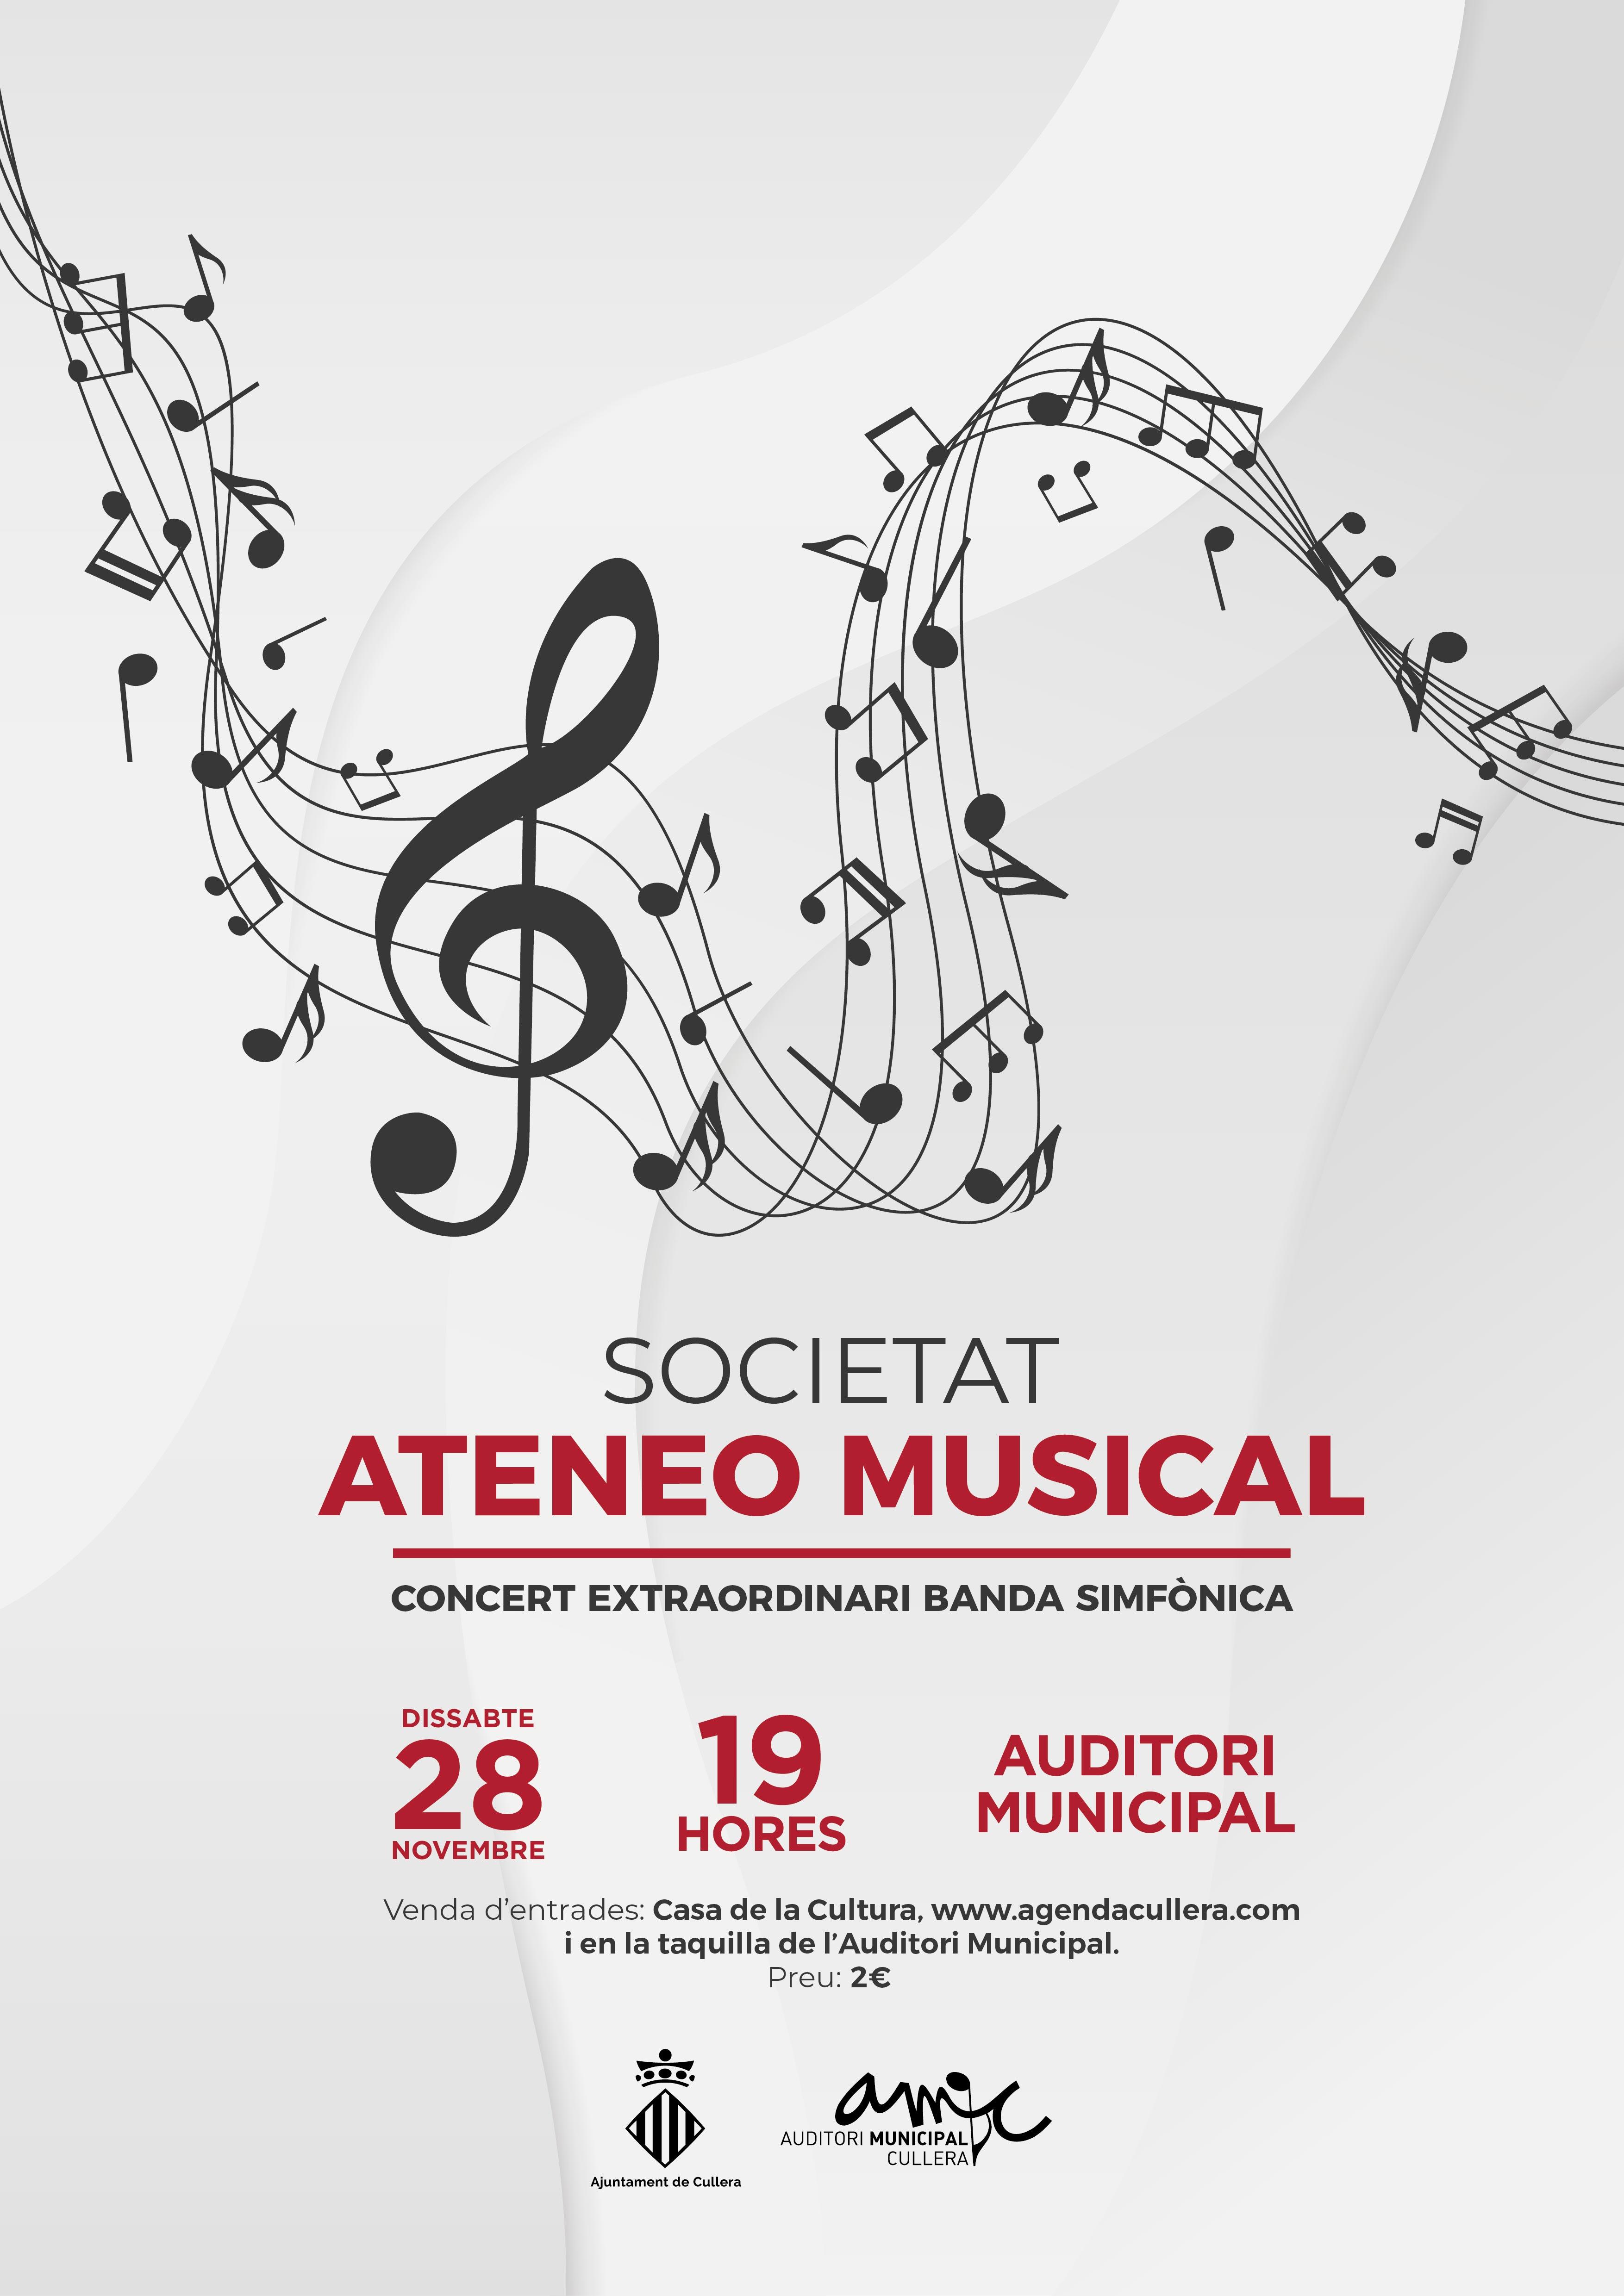 CONCERT EXTRAORDINARI BANDA SIMFONICA  ATENEO MUSICAL